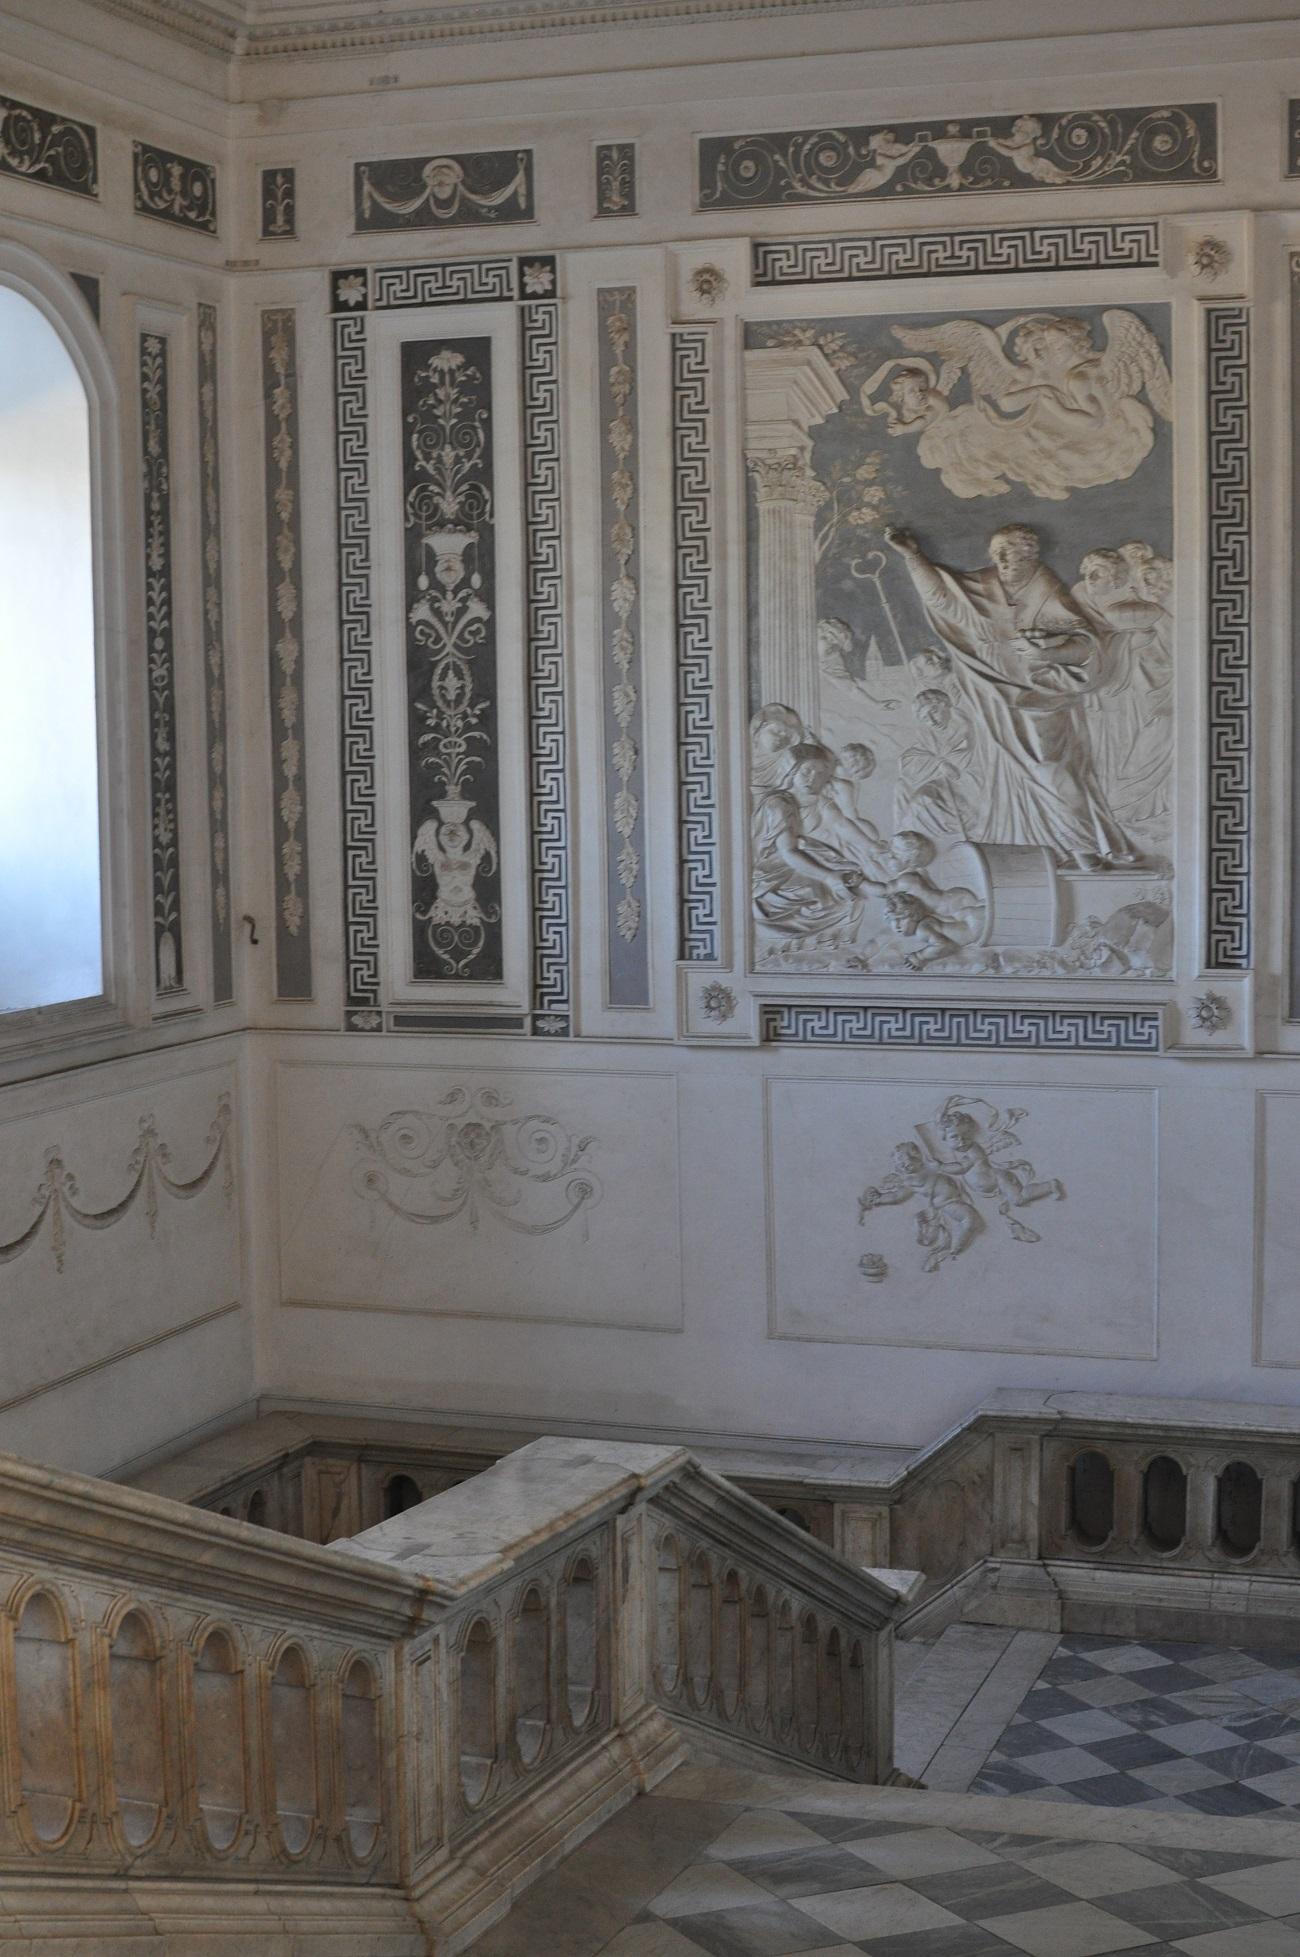 rocaille-blog-catania-sicilia-orientale-tour-59